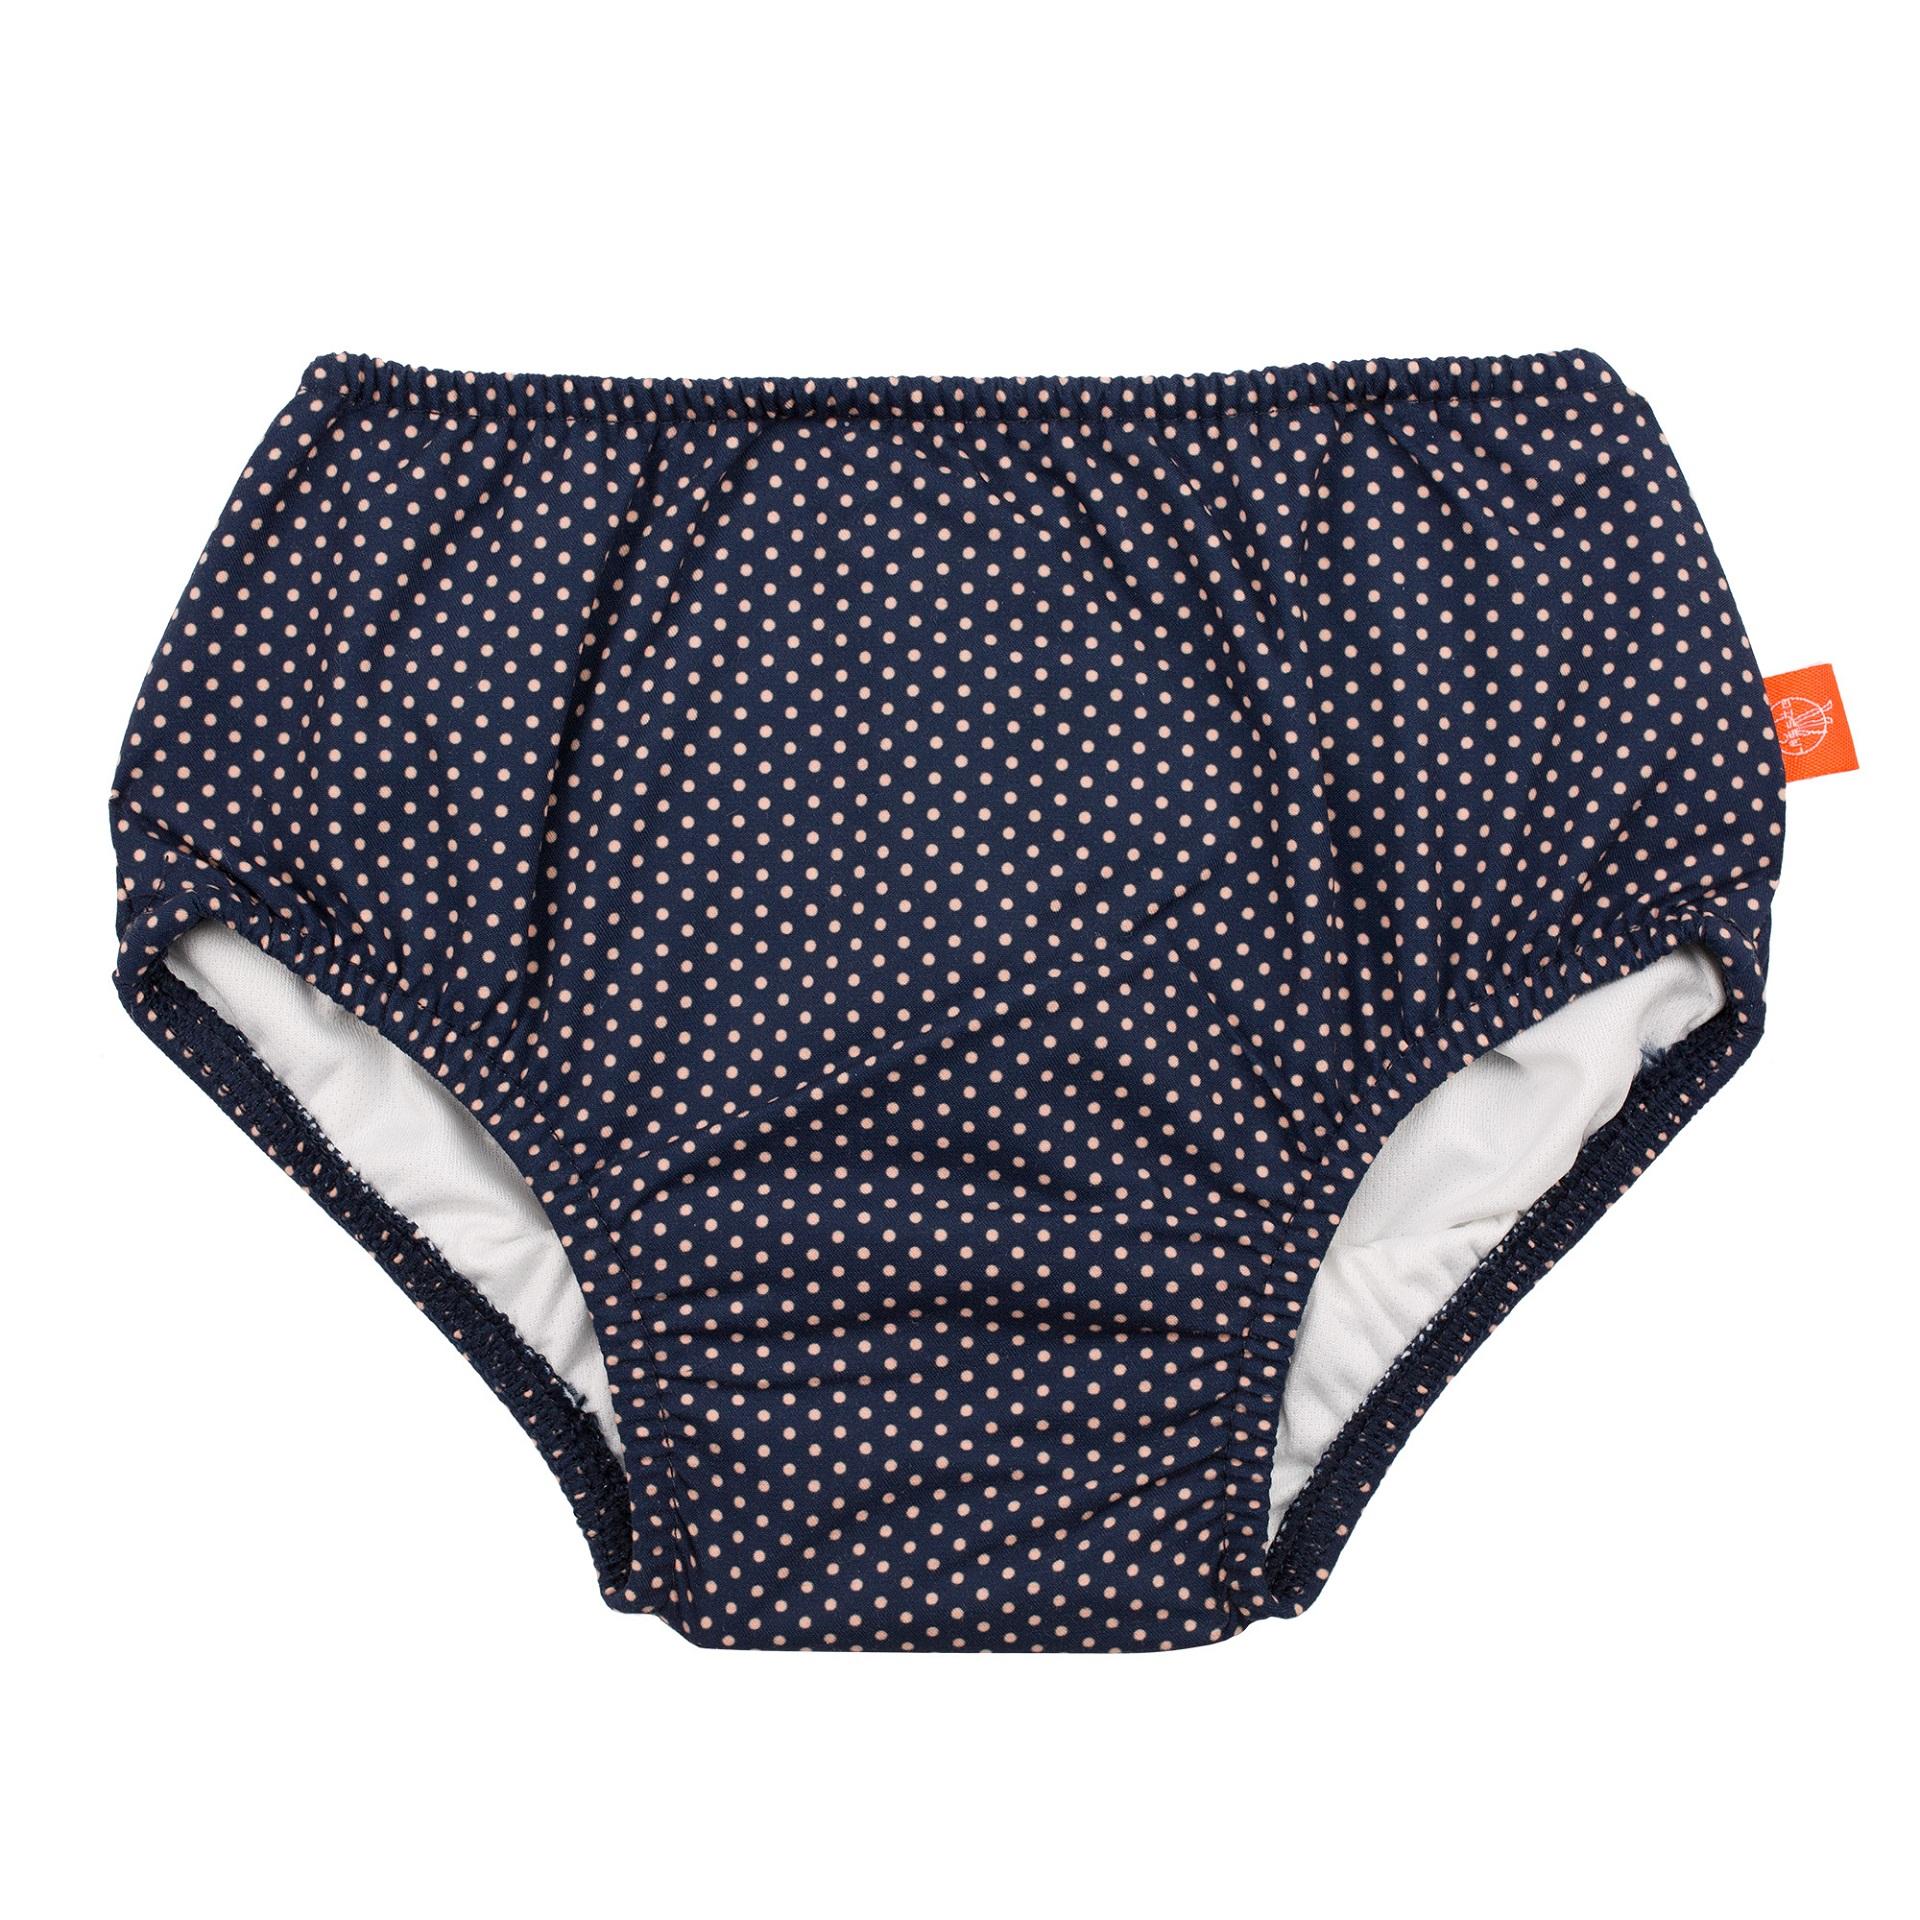 ac6ef2788 Pañal bañador para chicas Lässig polka dots 6-12 Monate - Comprar en ...